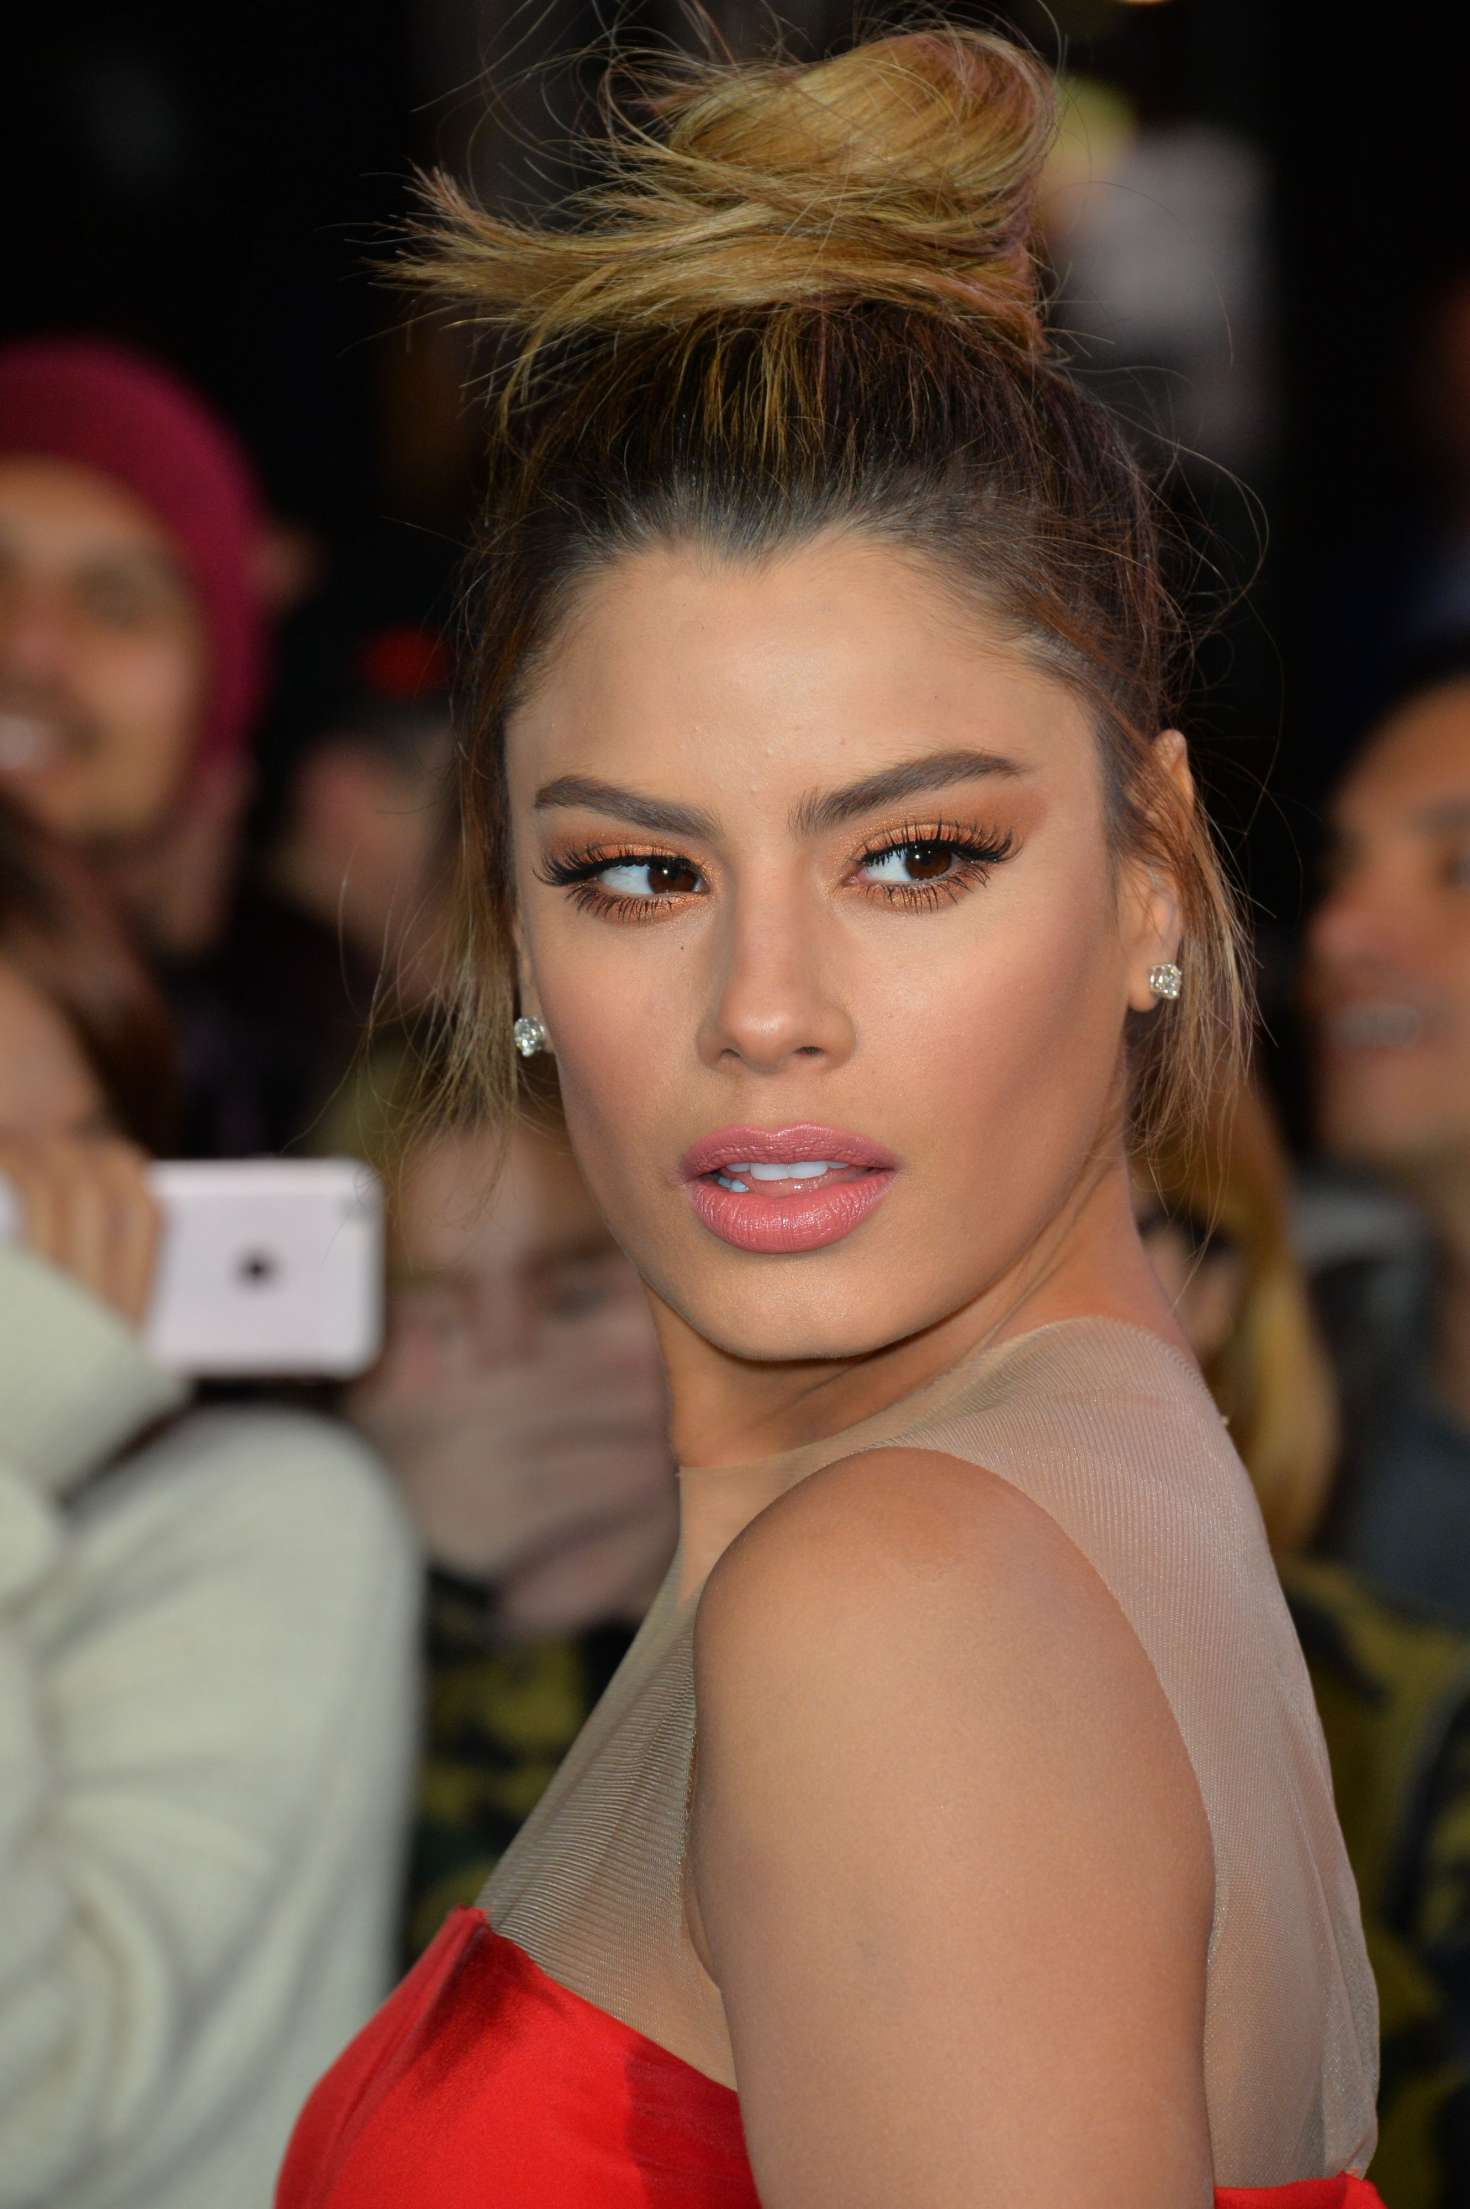 Ariadna Gutierrez nudes (33 foto and video), Sexy, Paparazzi, Boobs, lingerie 2018